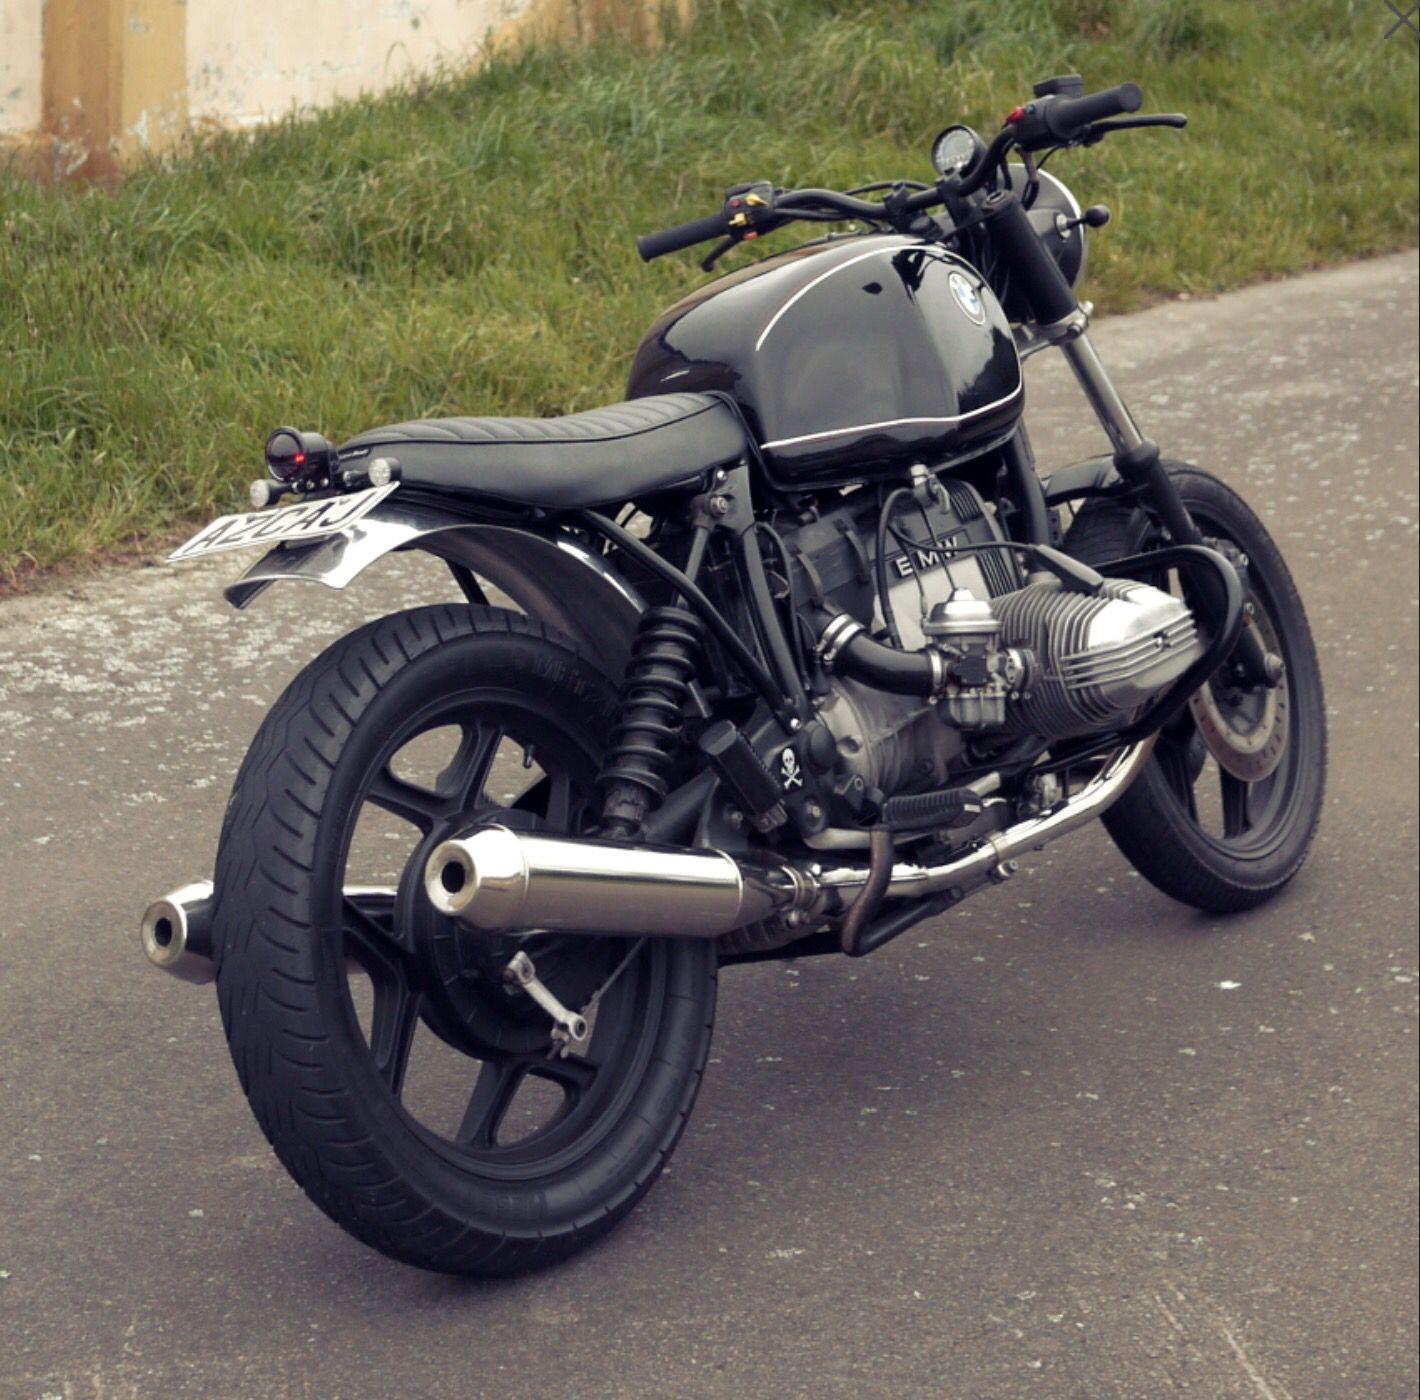 bmw r100r as quedar transformada moto bmw motorrad. Black Bedroom Furniture Sets. Home Design Ideas